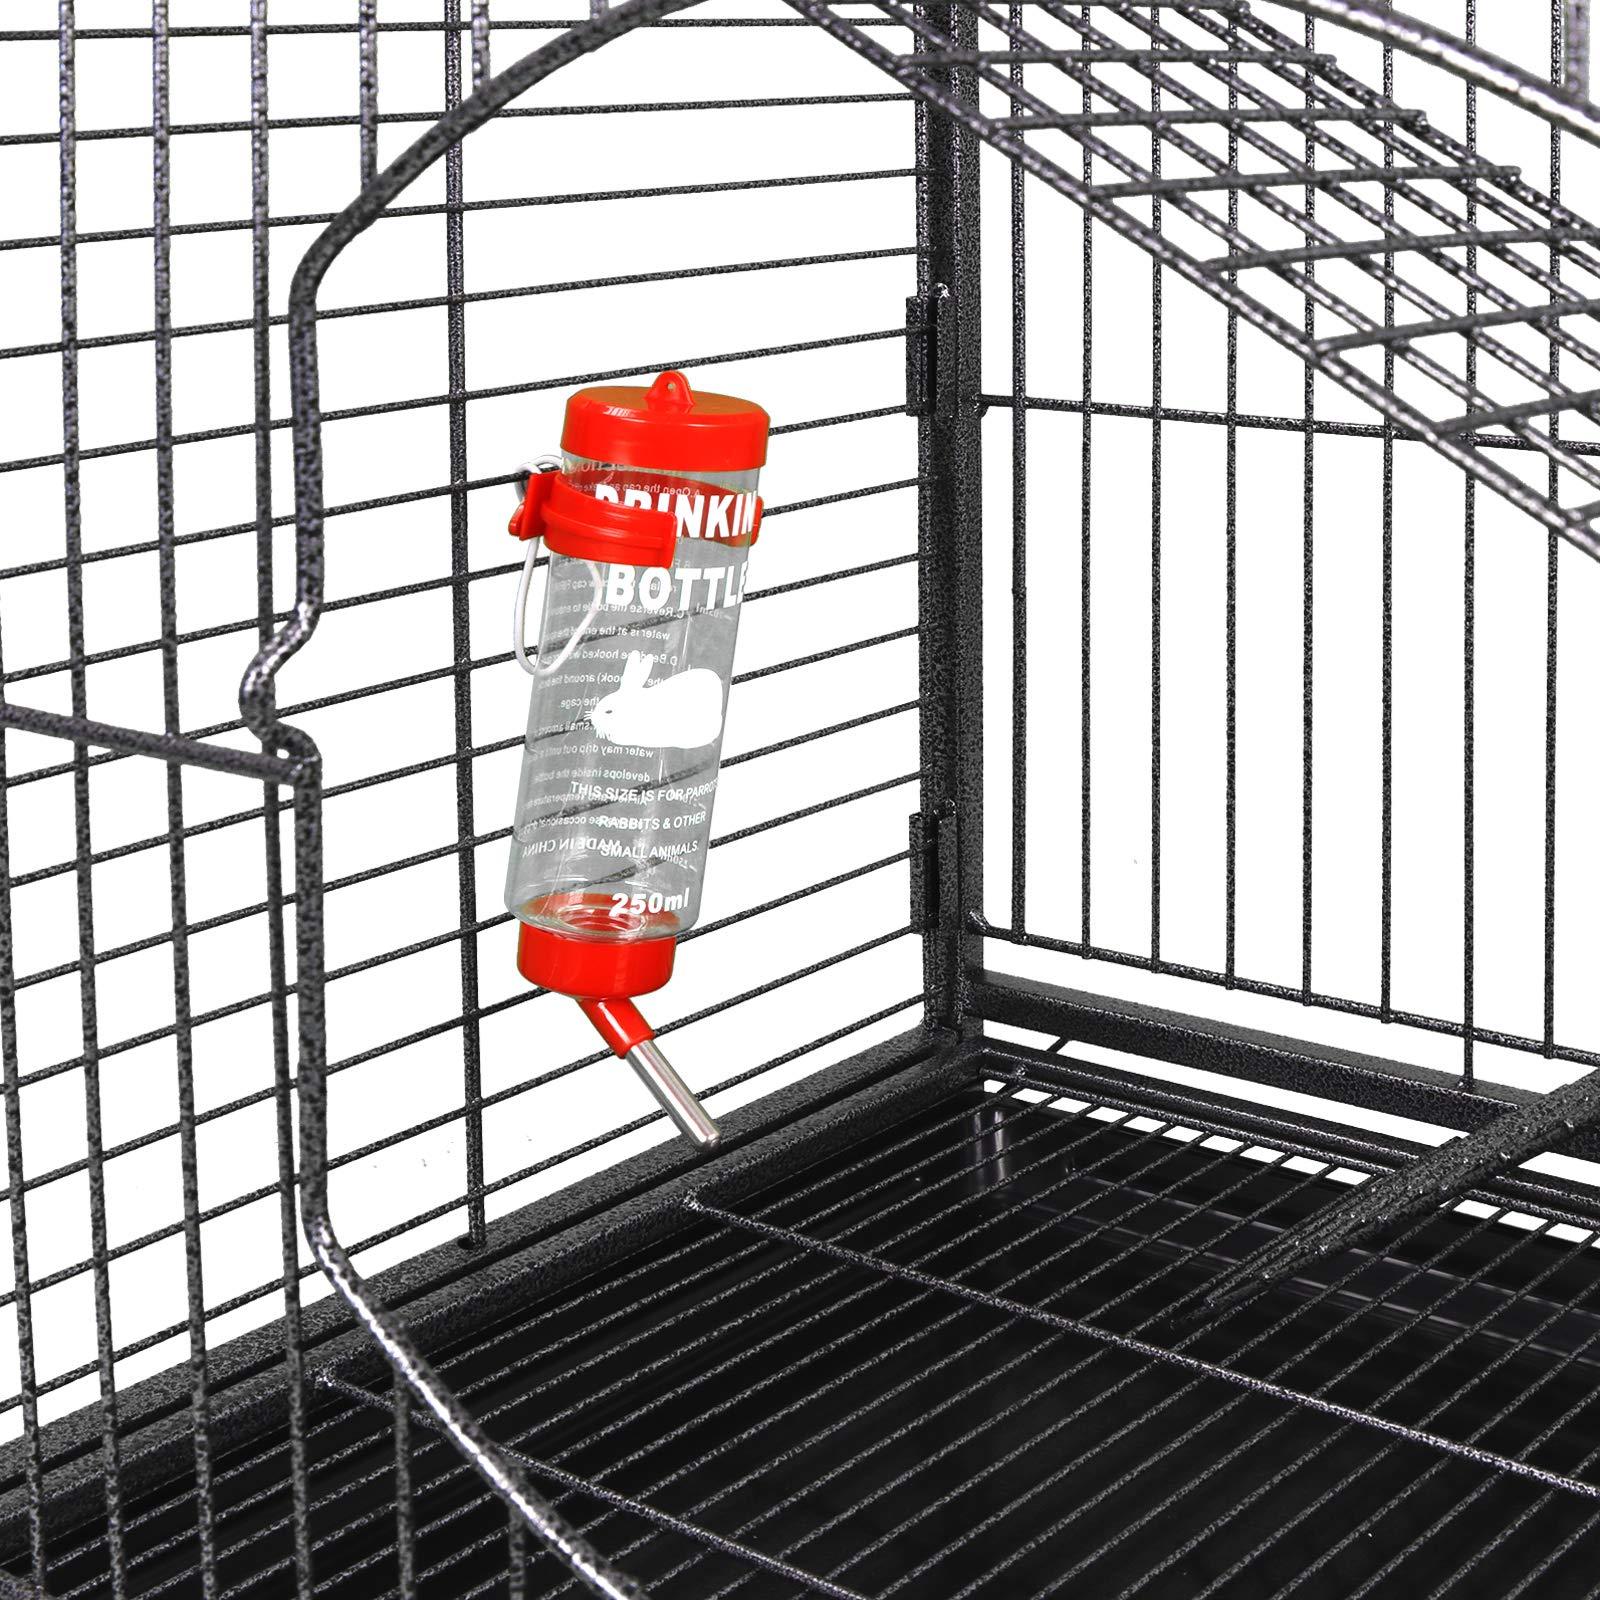 ZENY 37'' Ferret Cage Rabbit Guinea Pig Chinchilla Rat Small Animal House 4 Levels (Black)